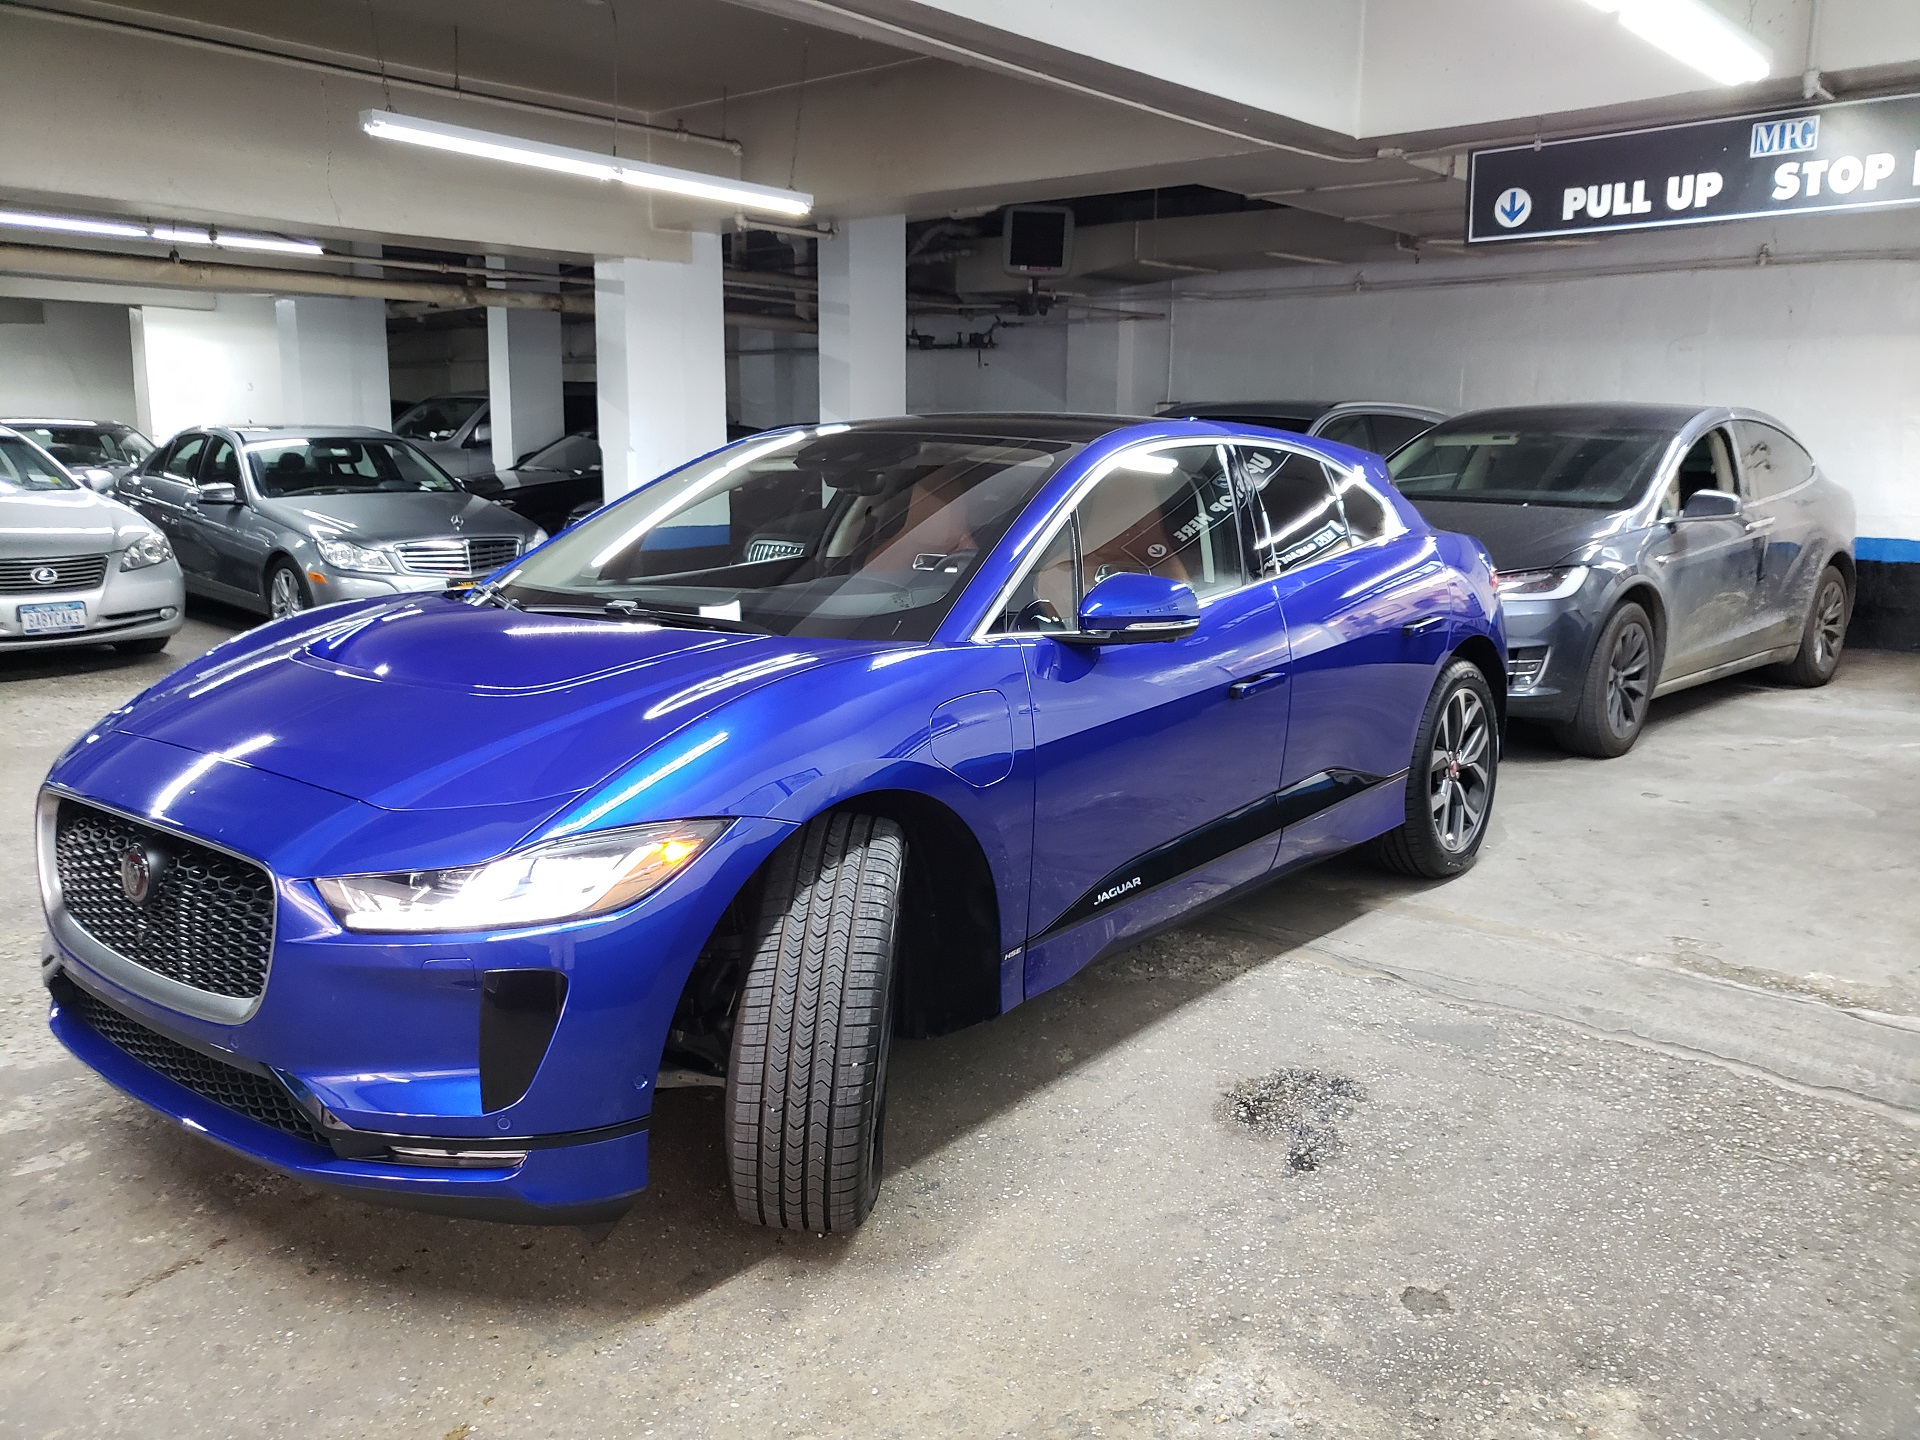 2019 Jaguar I-Pace EV: Design, Specs, Mileage, Price >> The 2019 Jaguar I Pace A City Boy And Range Anxiety